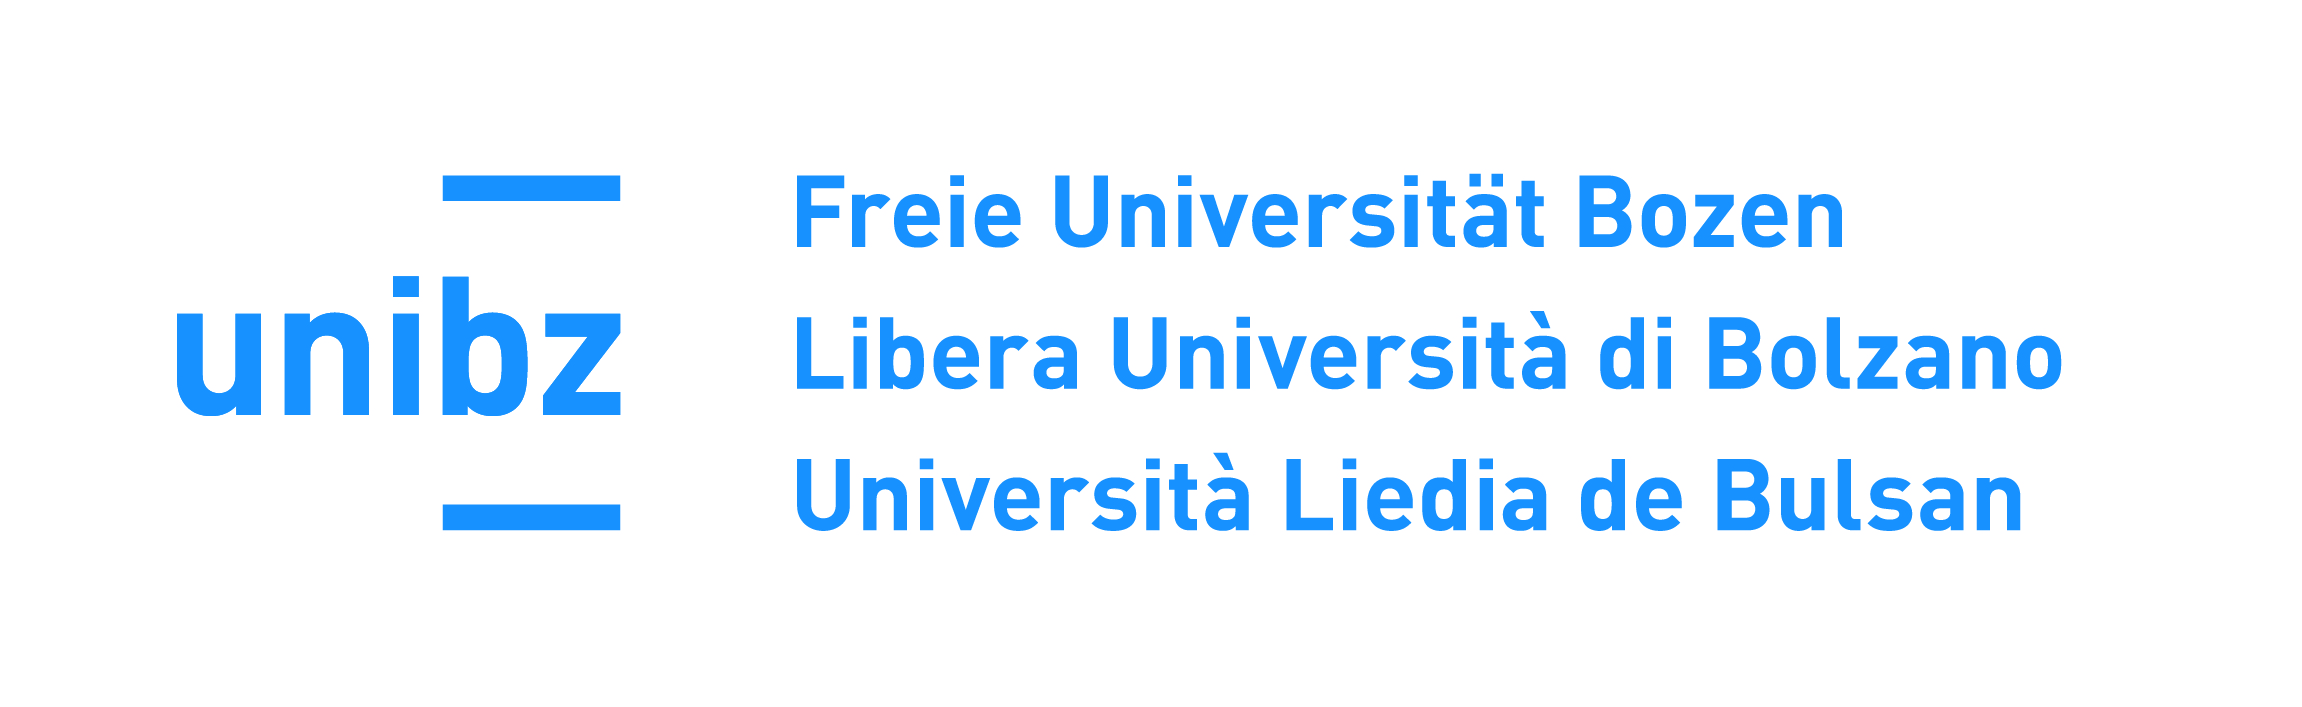 Logo Freie Universität Bozen; Libera Università di Bolzano; Università Liedia de Bulsan